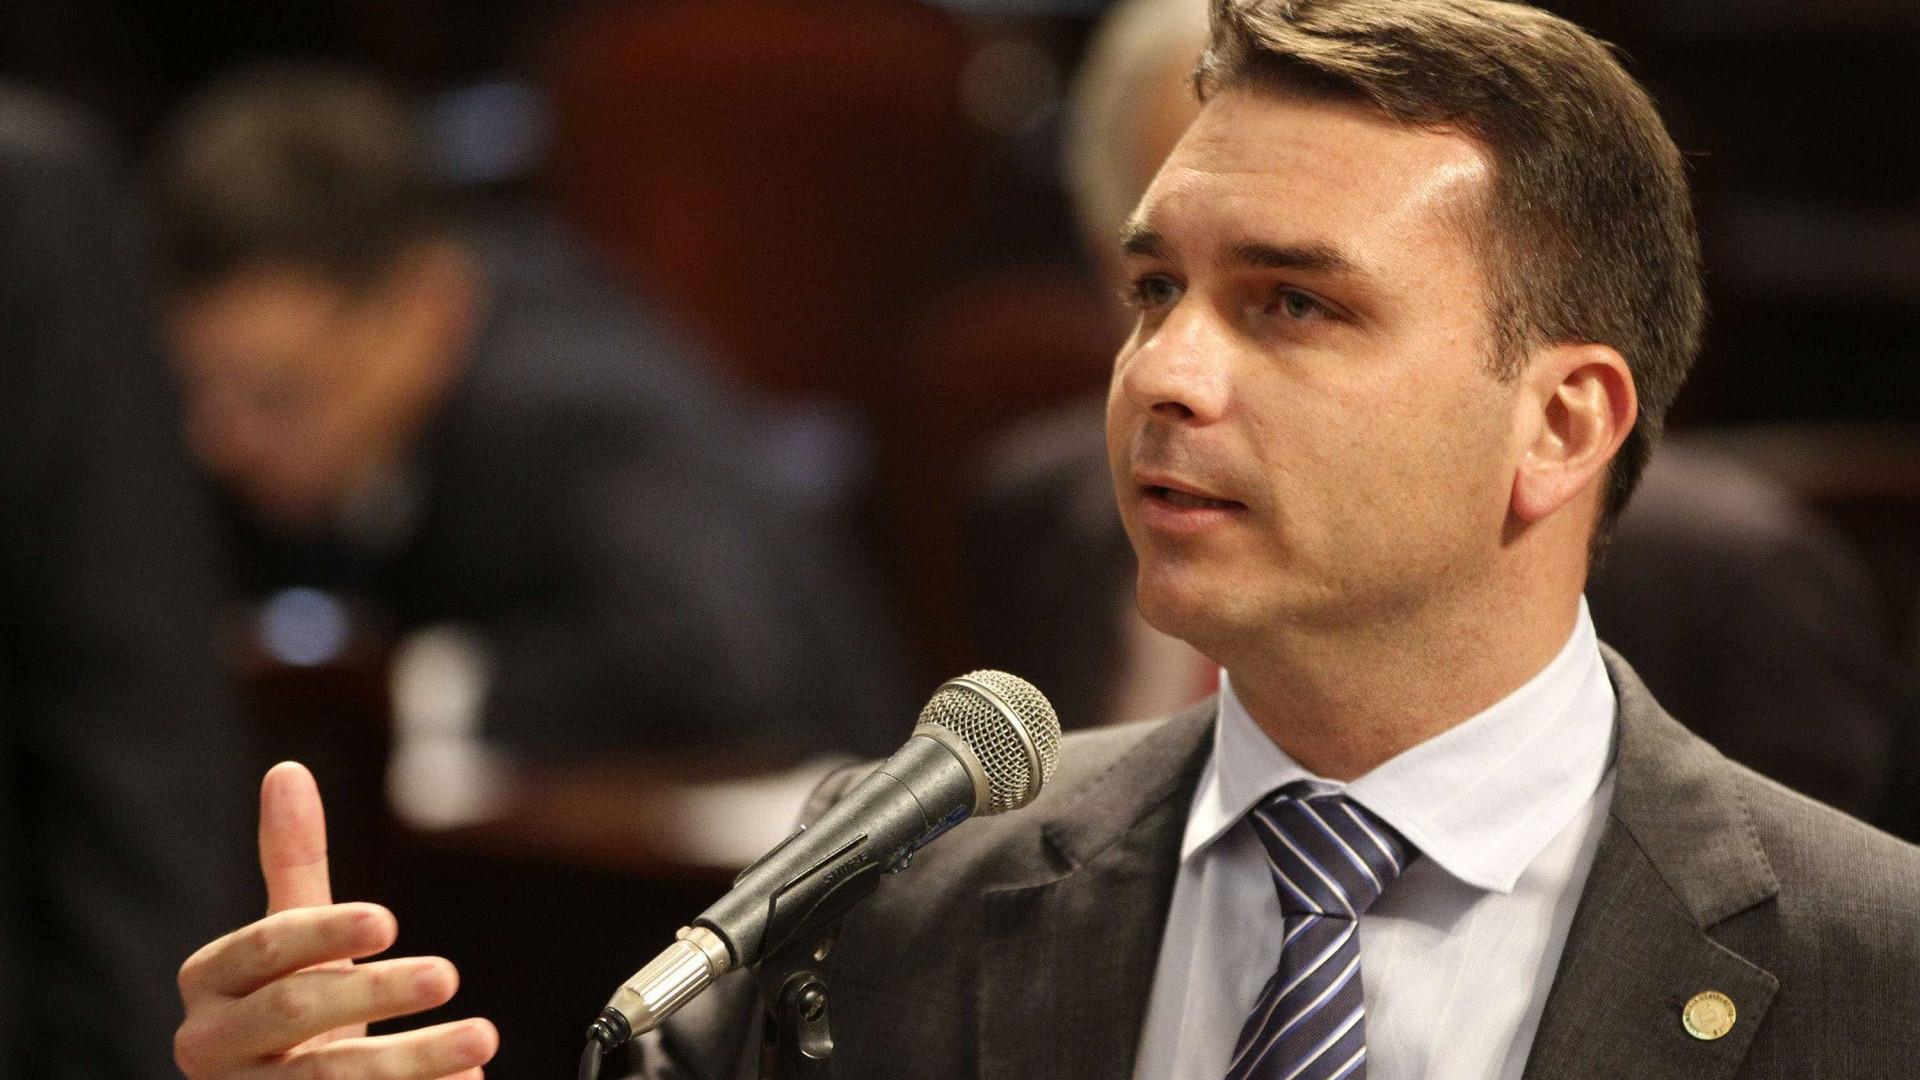 Saques de ex-auxiliar de Bolsonaro ocorriam após depósitos similares